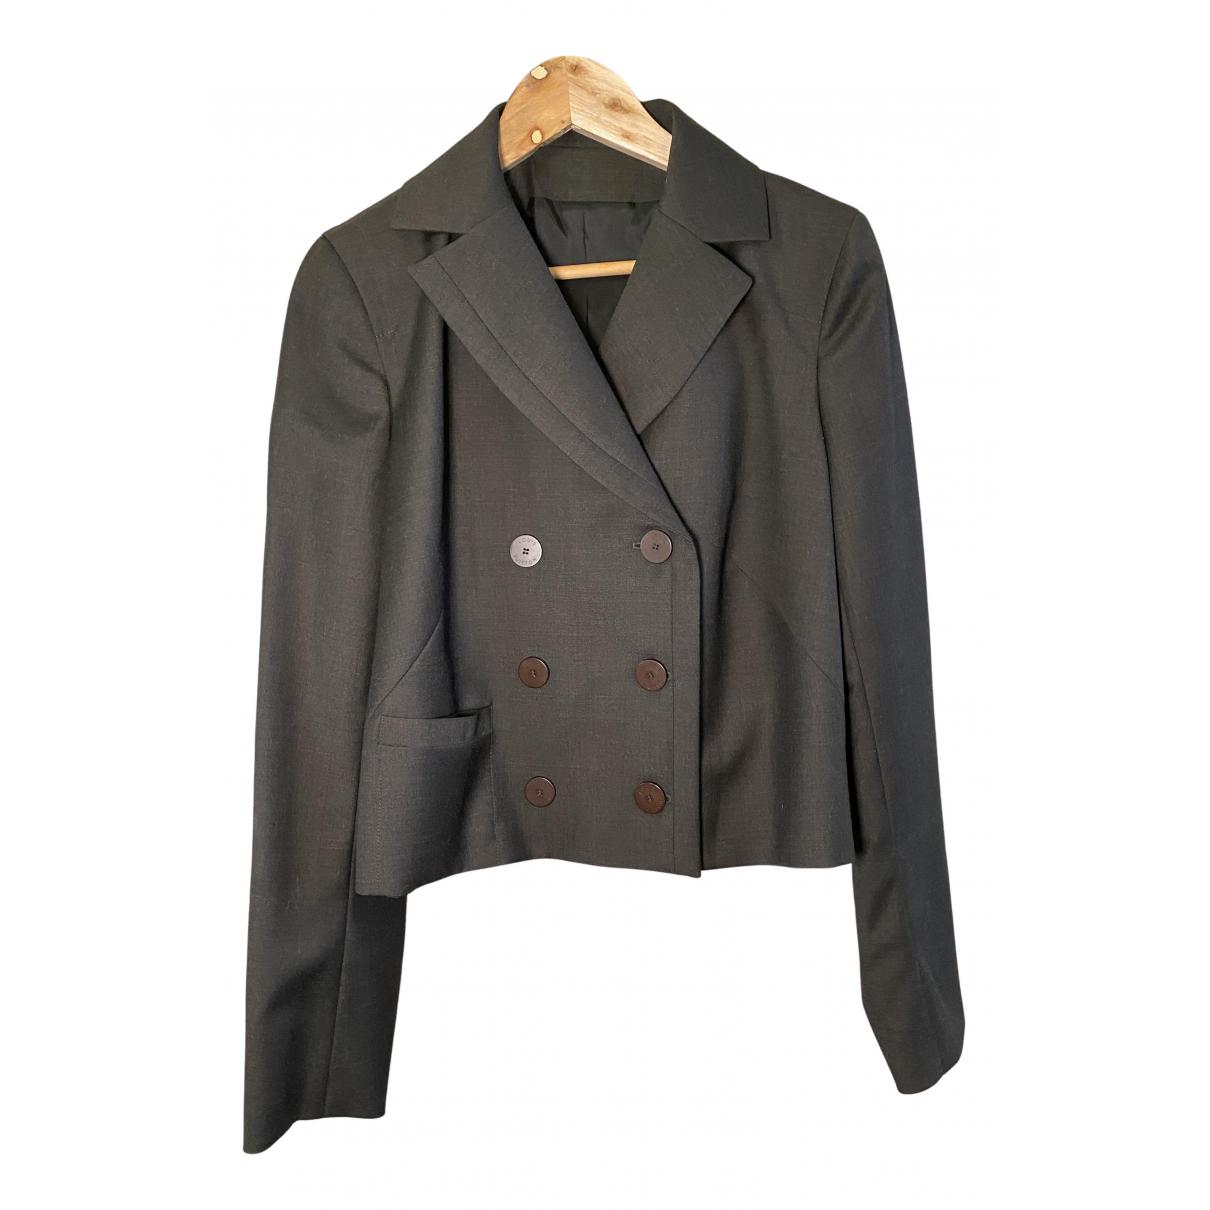 Louis Vuitton \N Jacke in  Grau Wolle